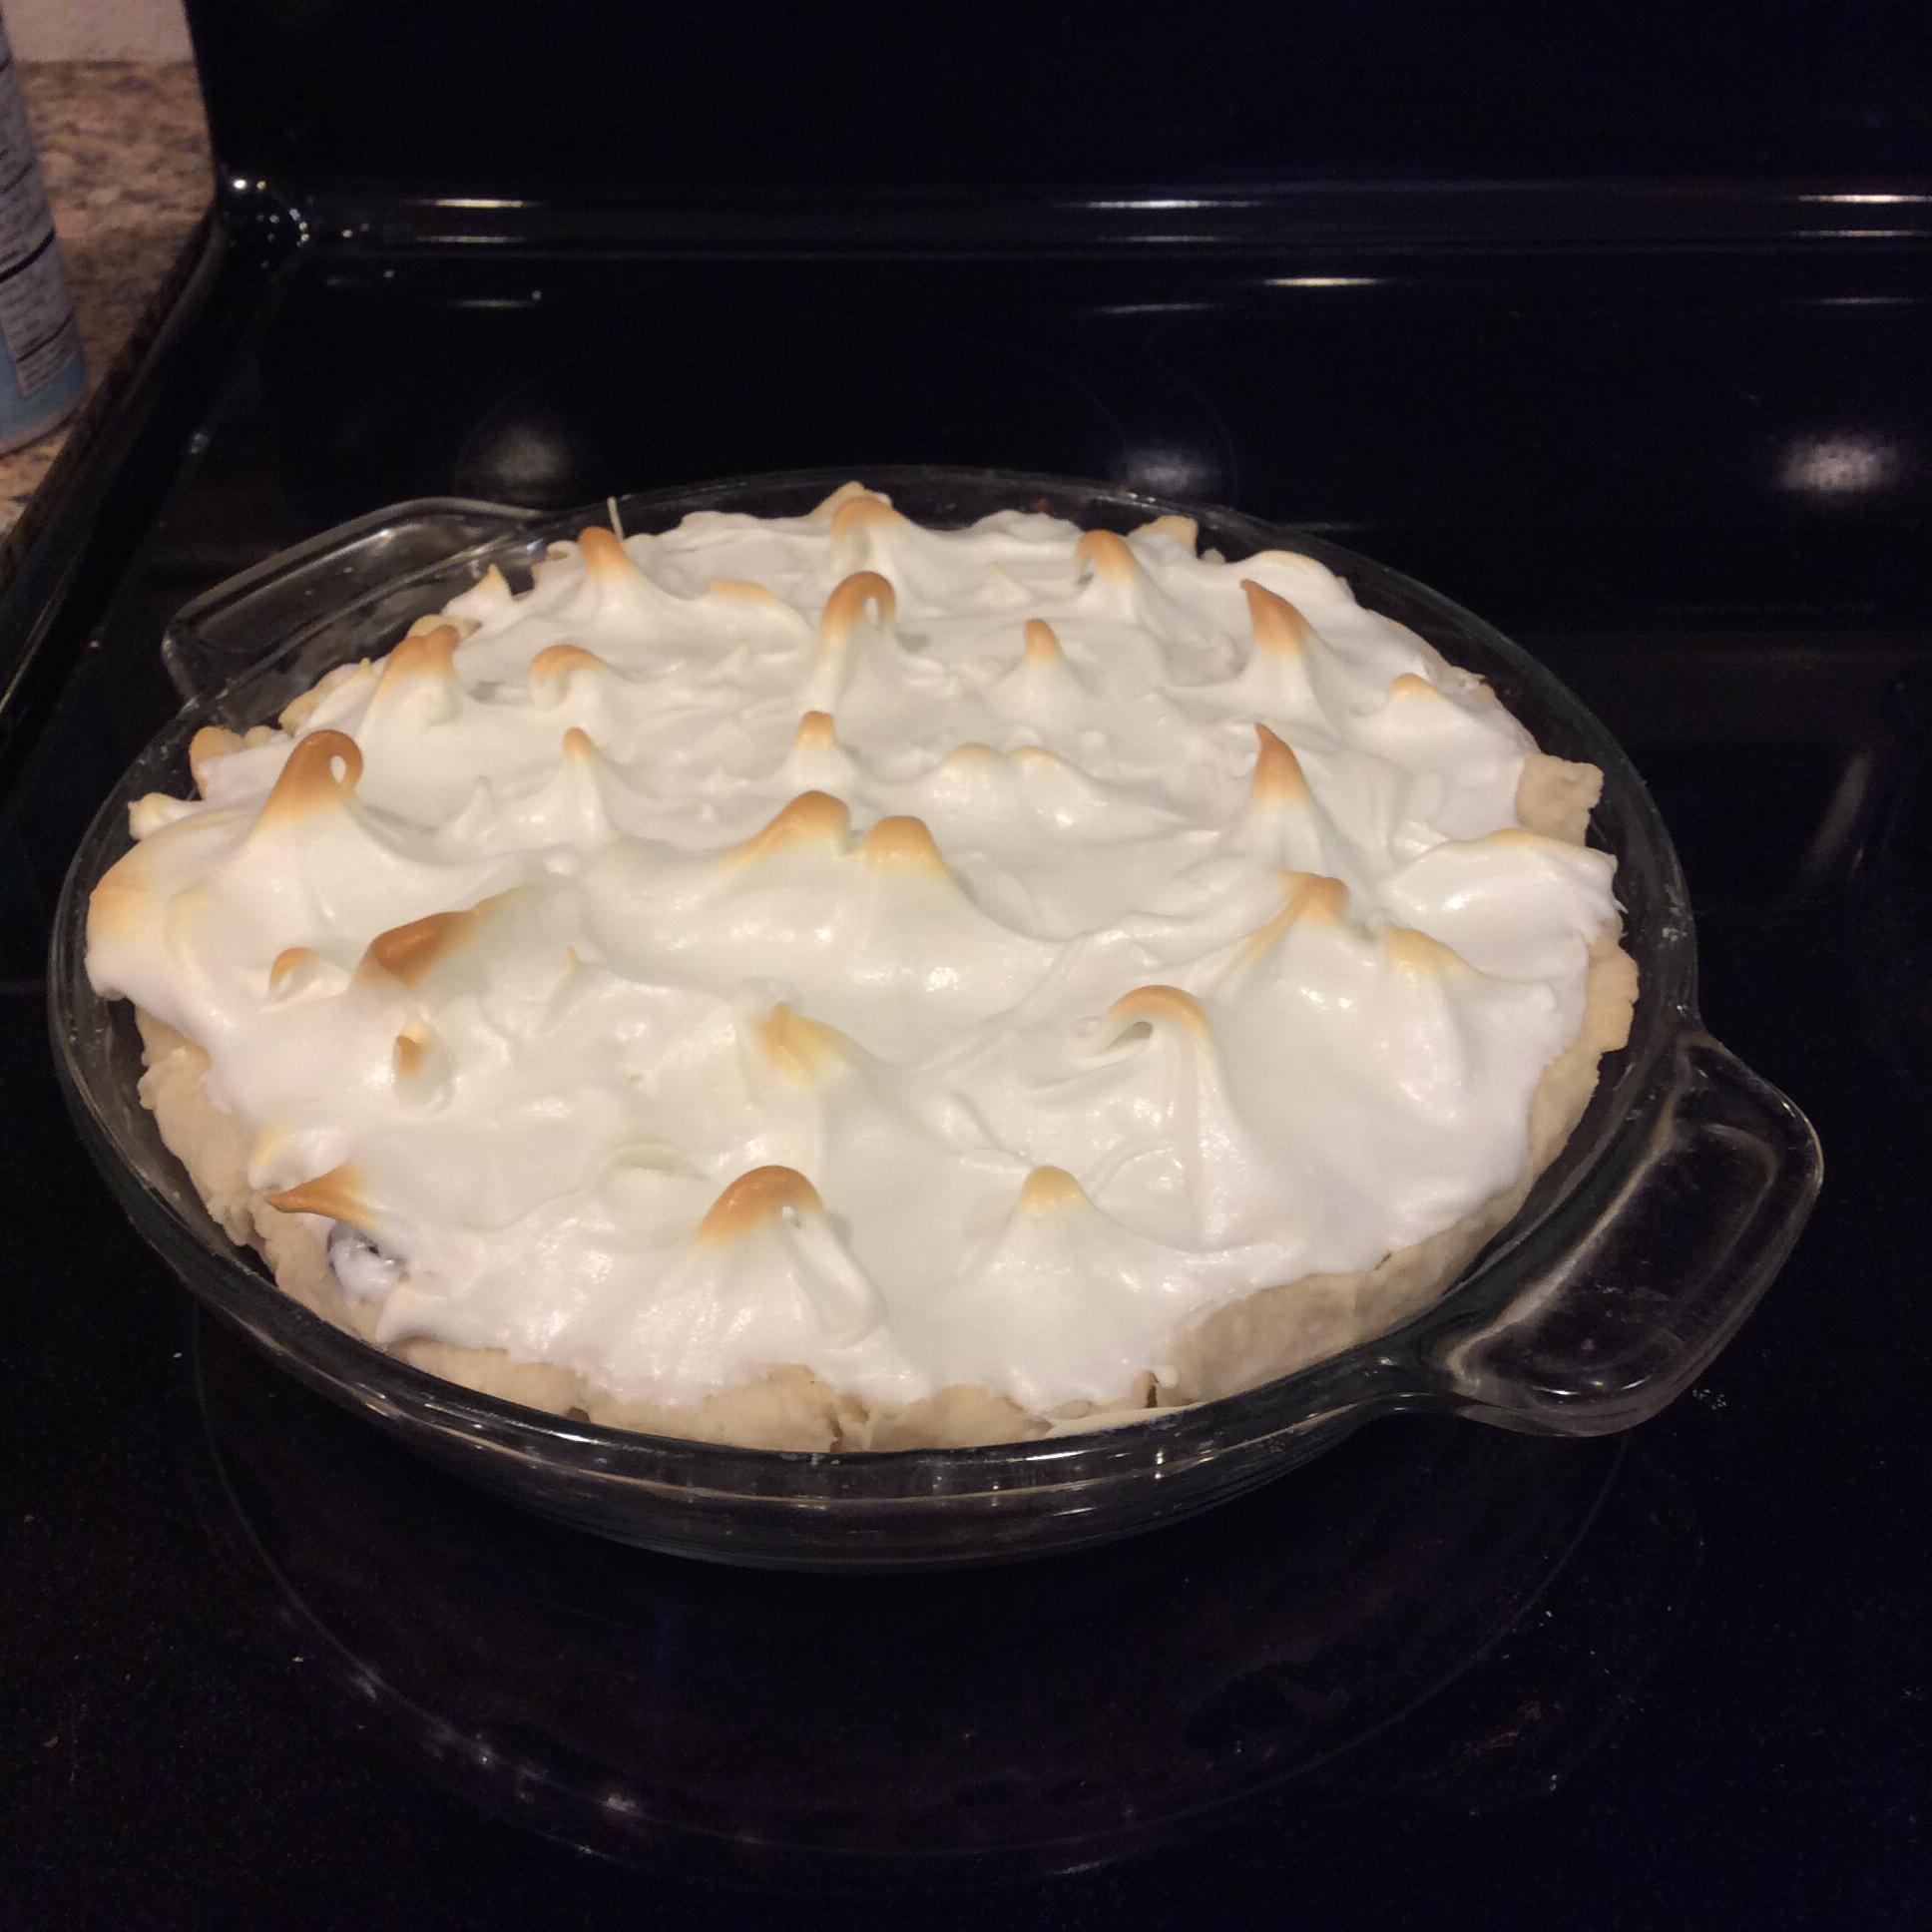 Mom's Chocolate Meringue Pie P!3!$G00d